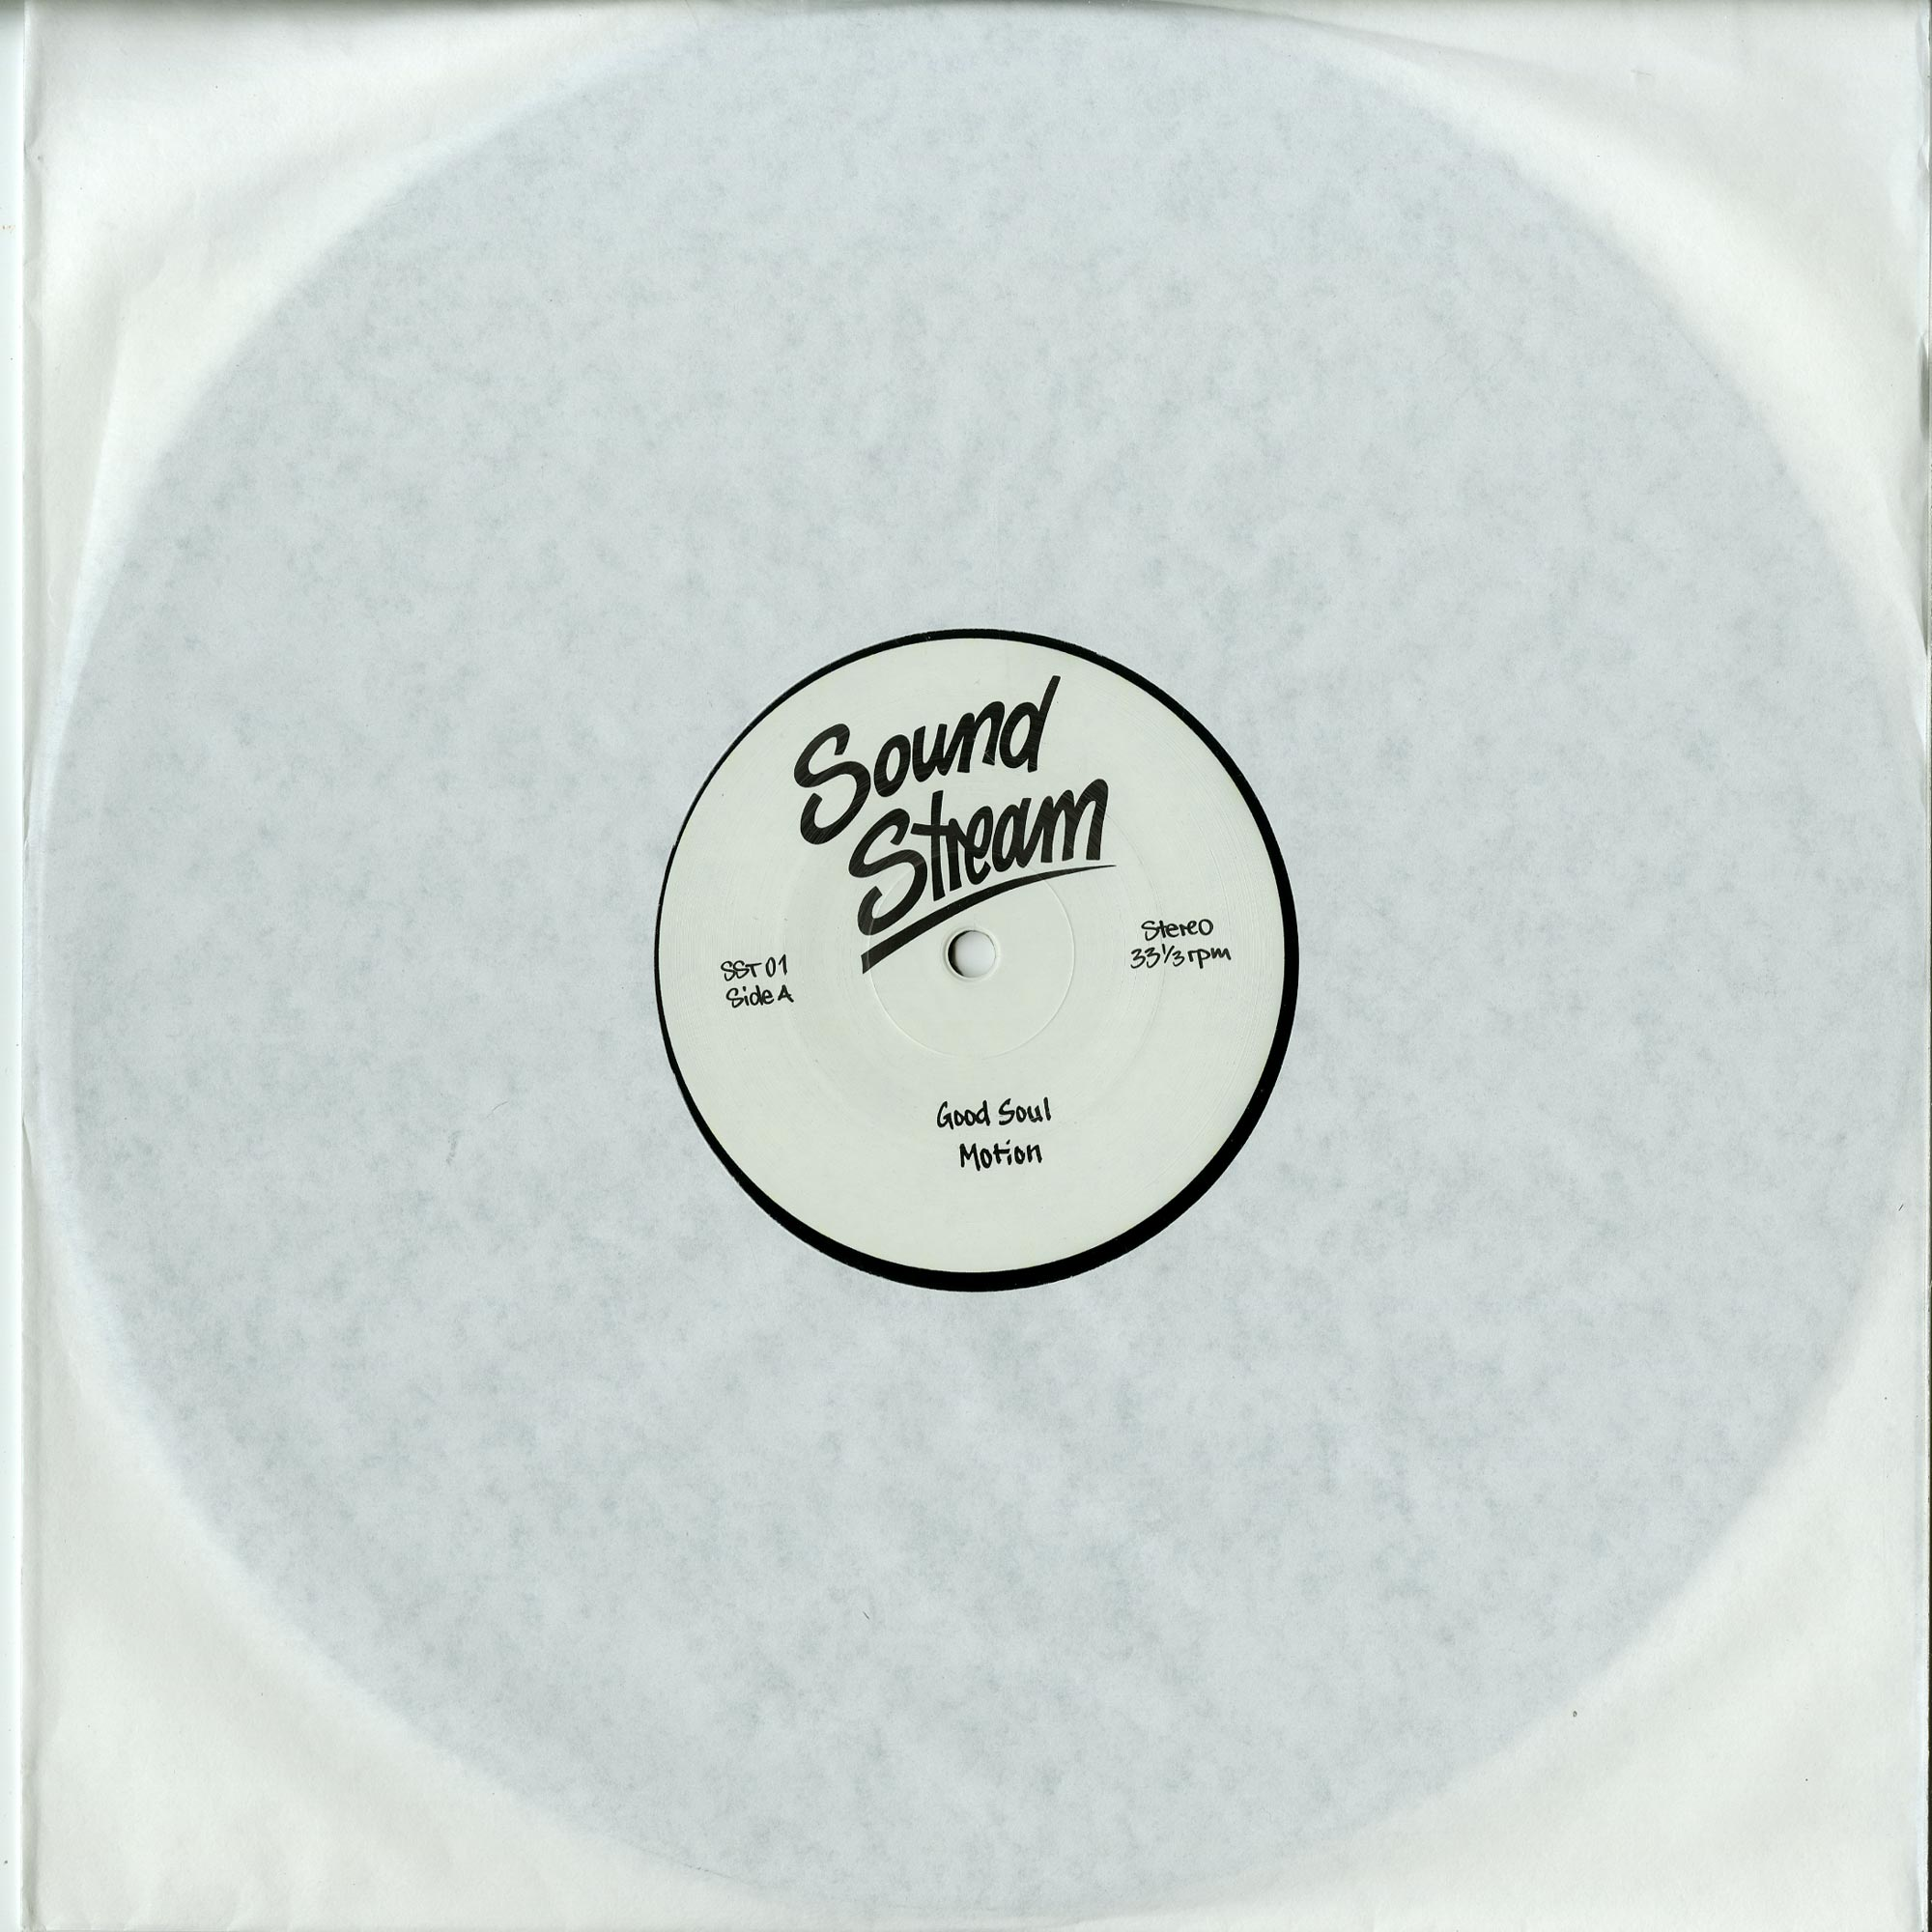 Soundstream - GOOD SOUL